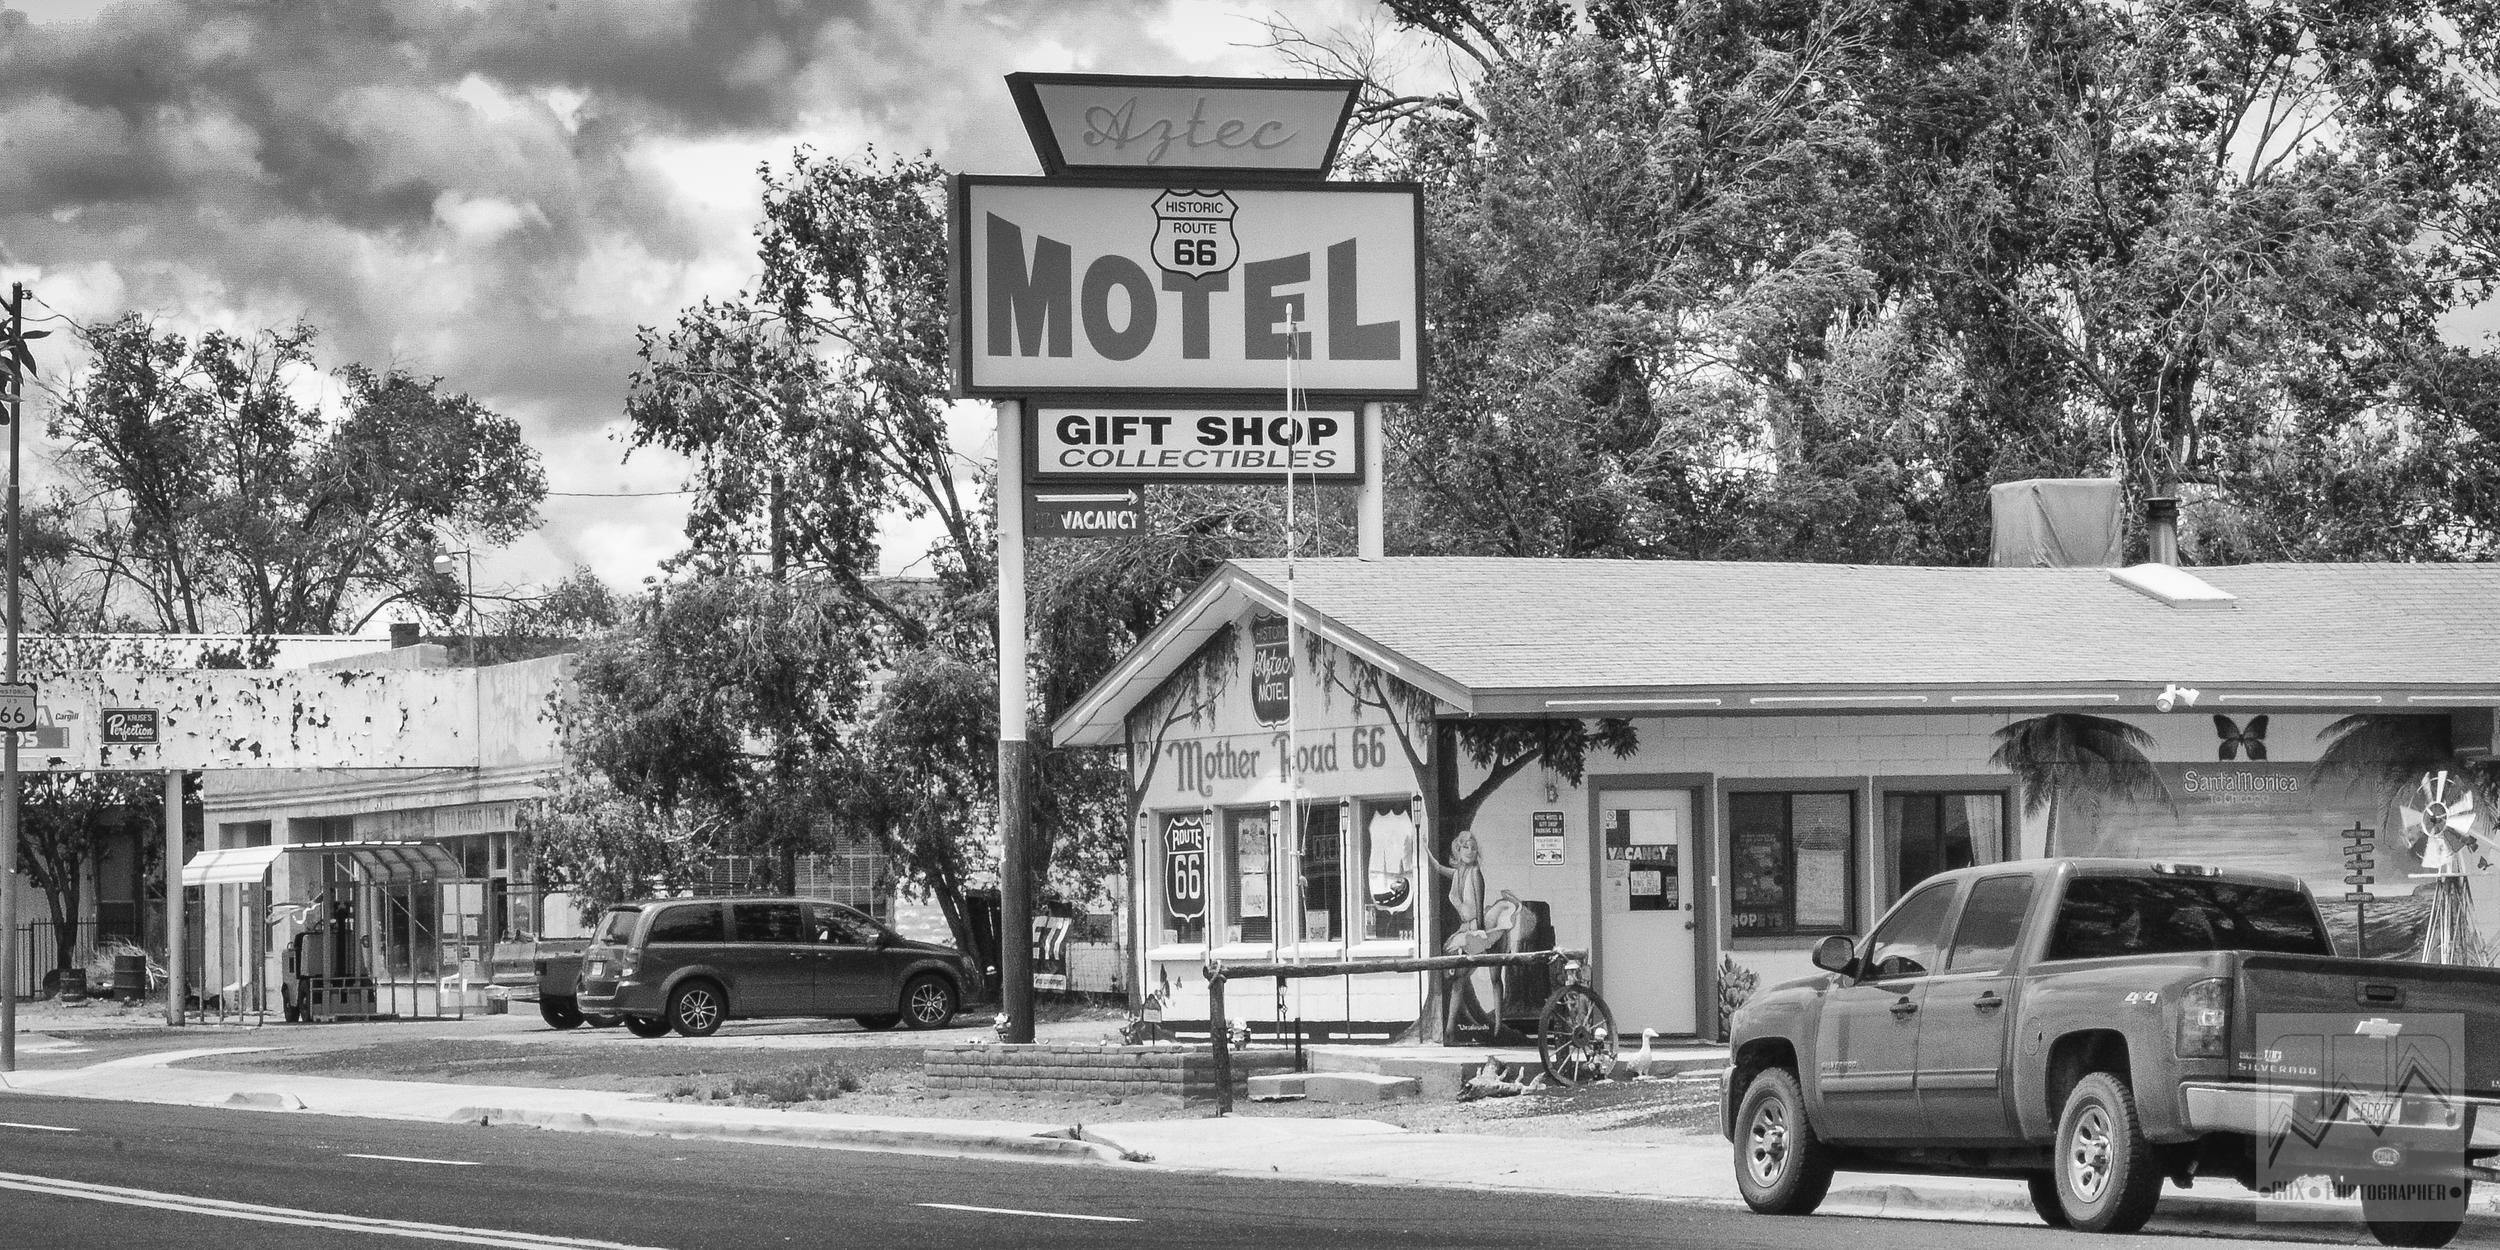 Car route66 motel.jpg